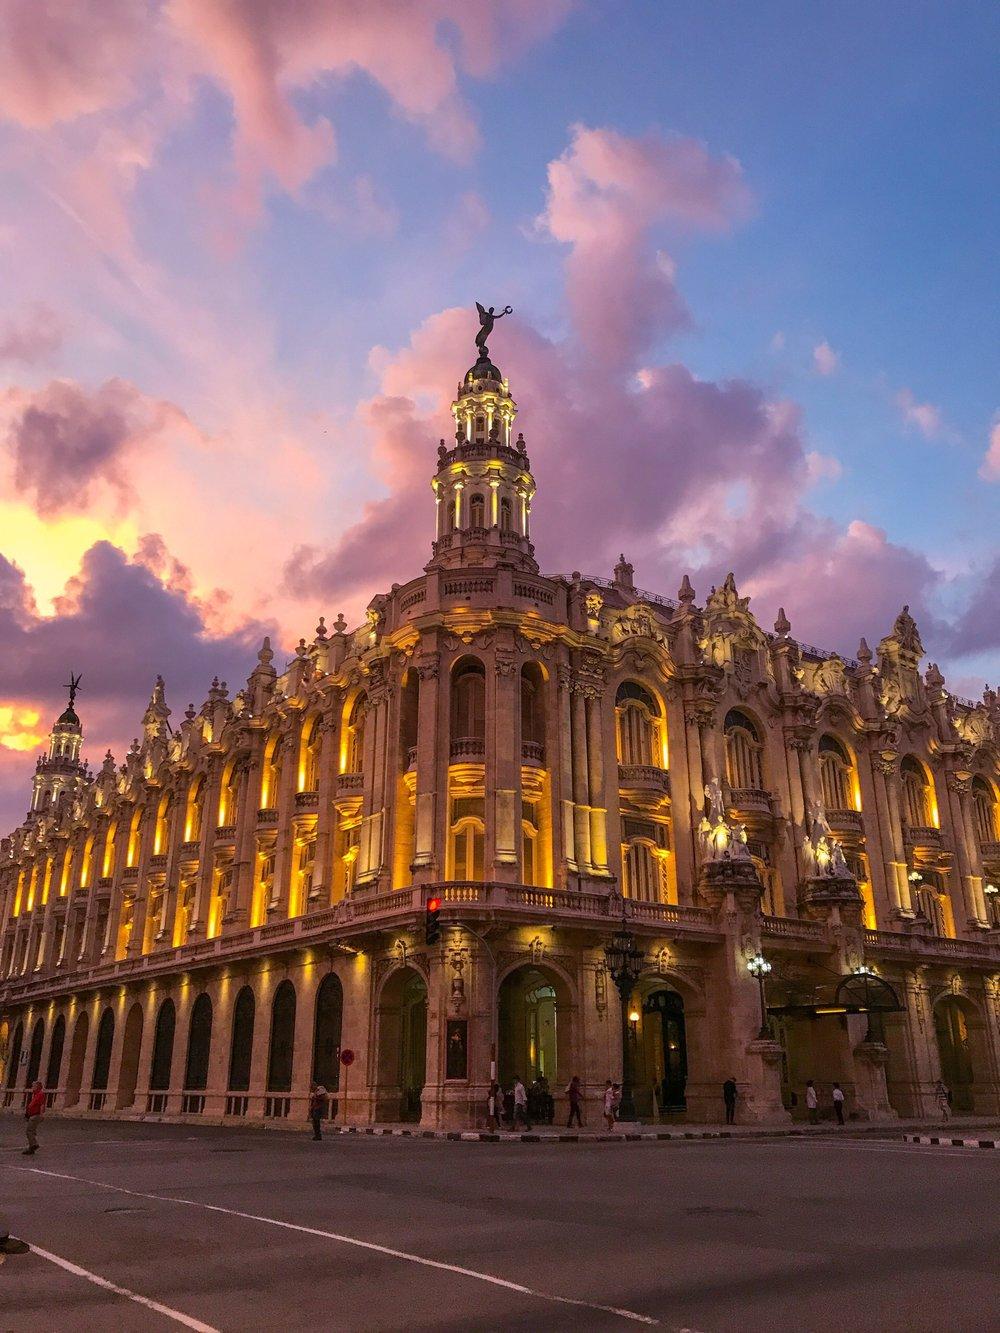 Sunset in Old Havana